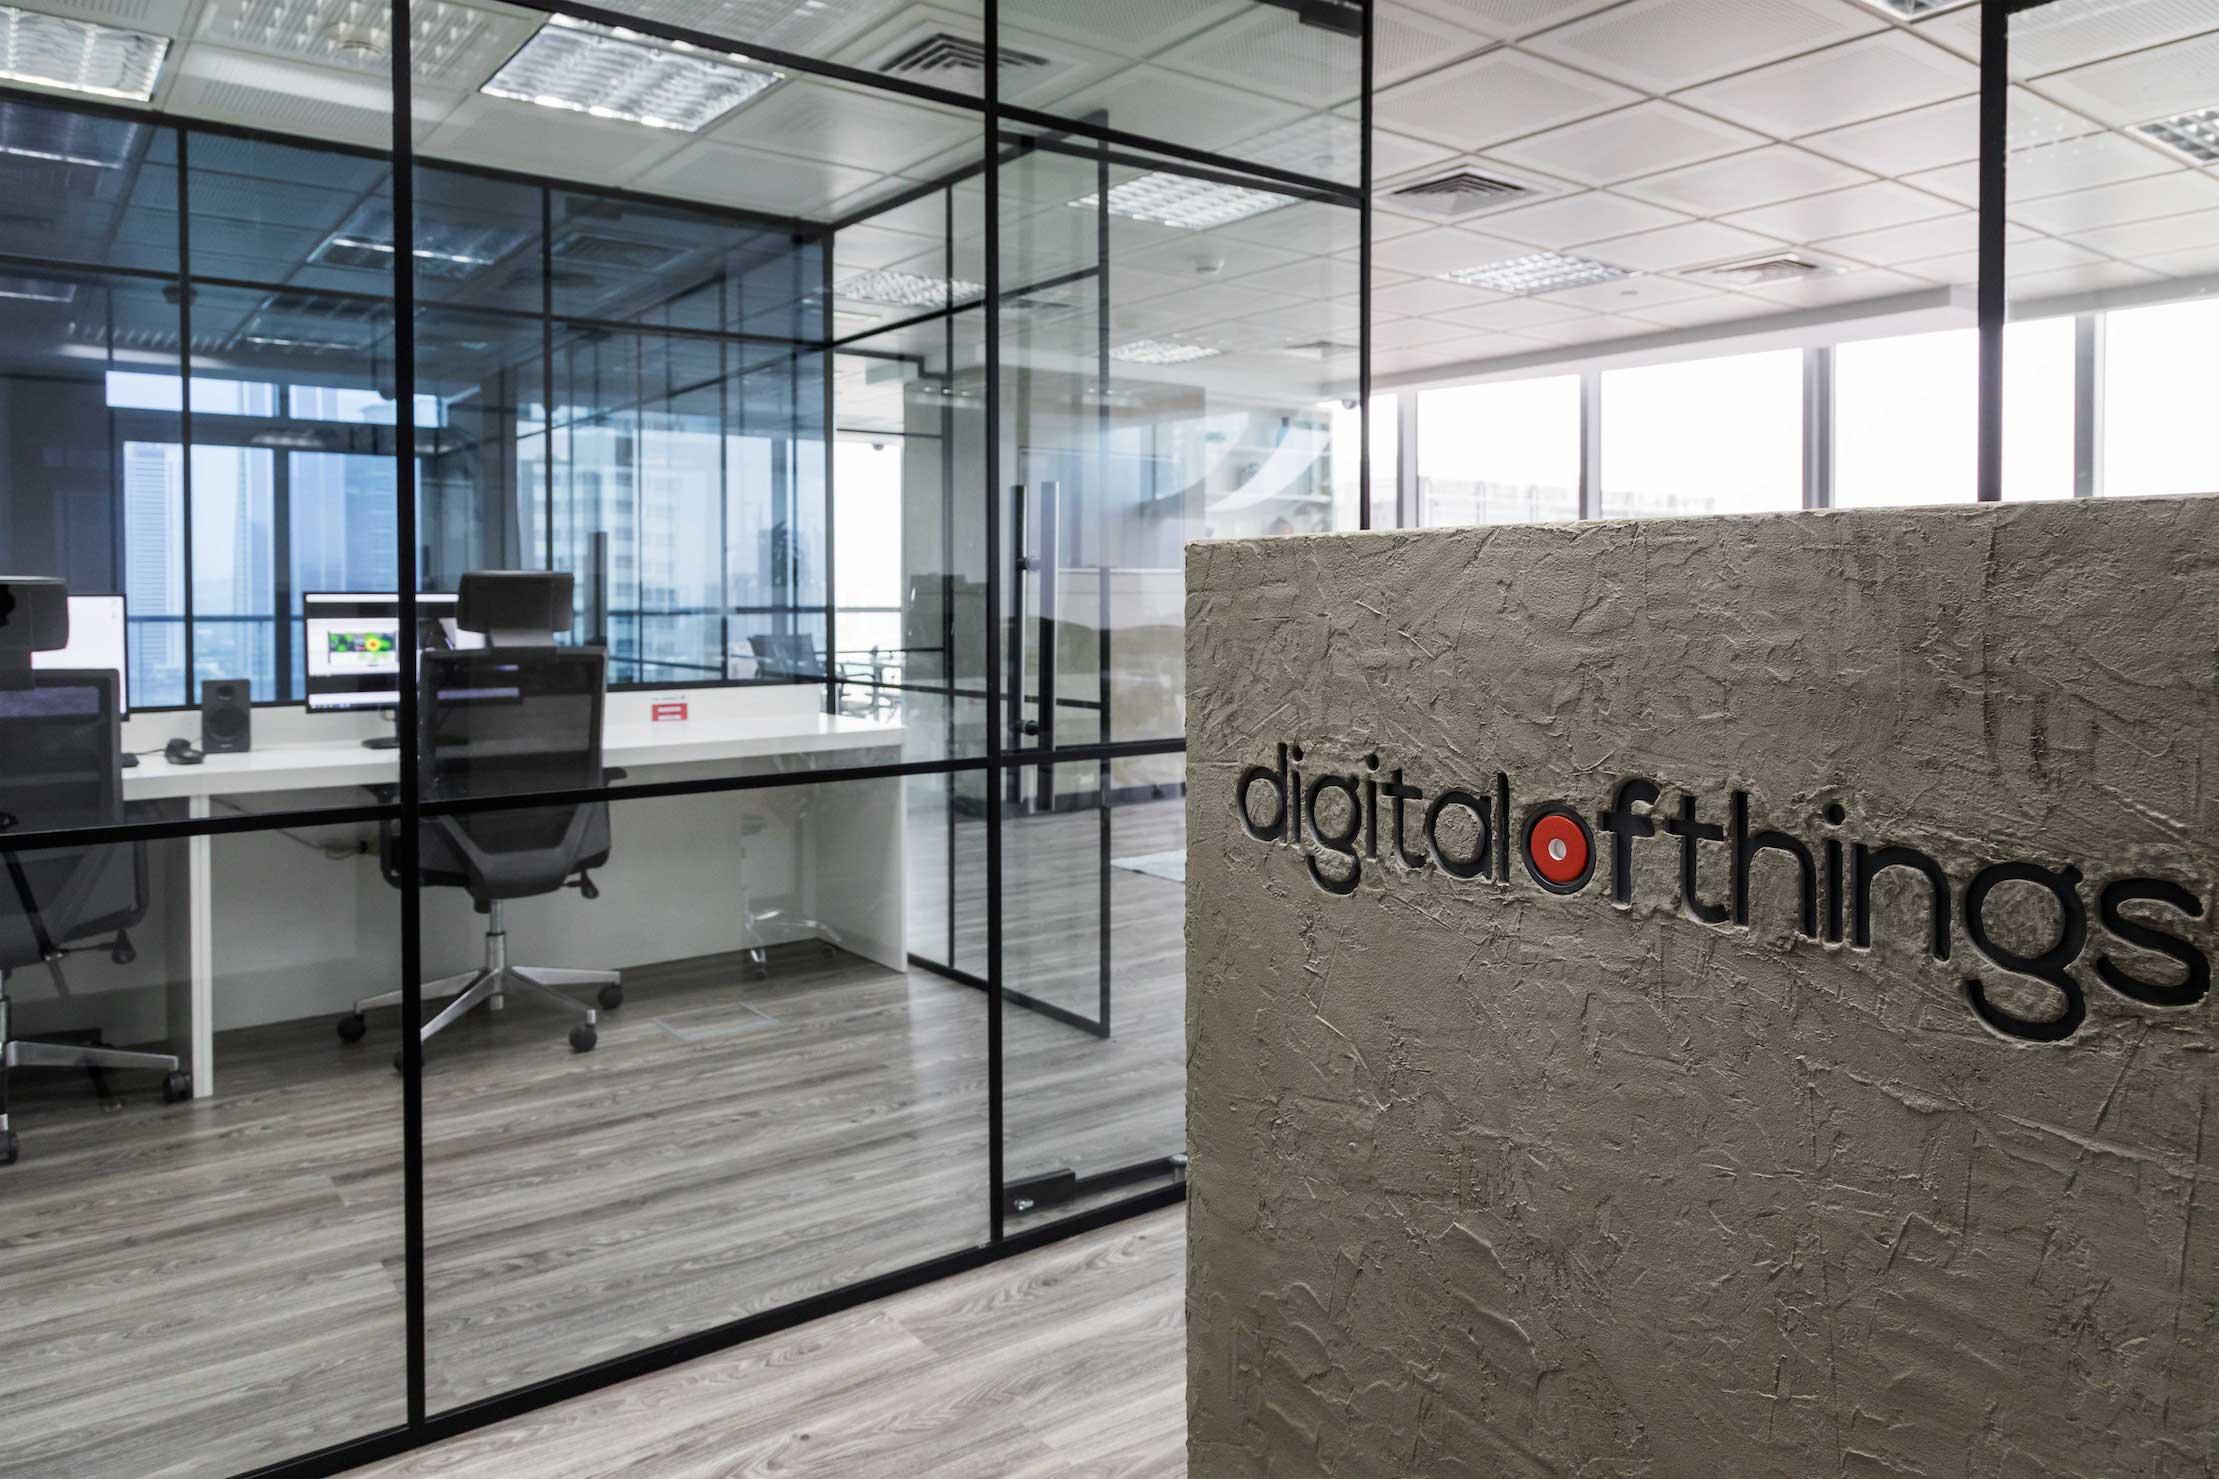 Office entrance of digital of things